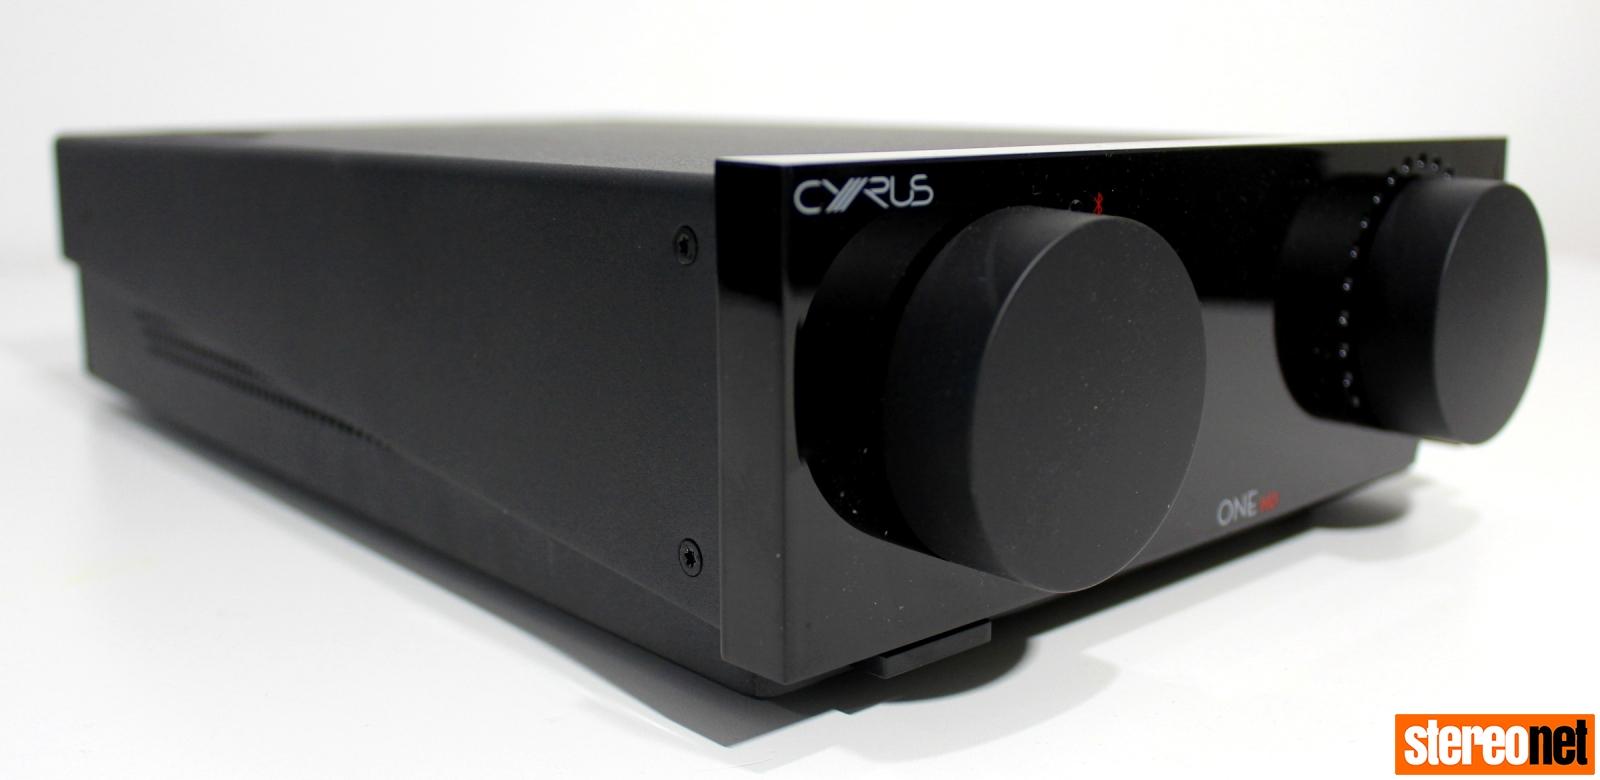 Cyrus ONE HD angle